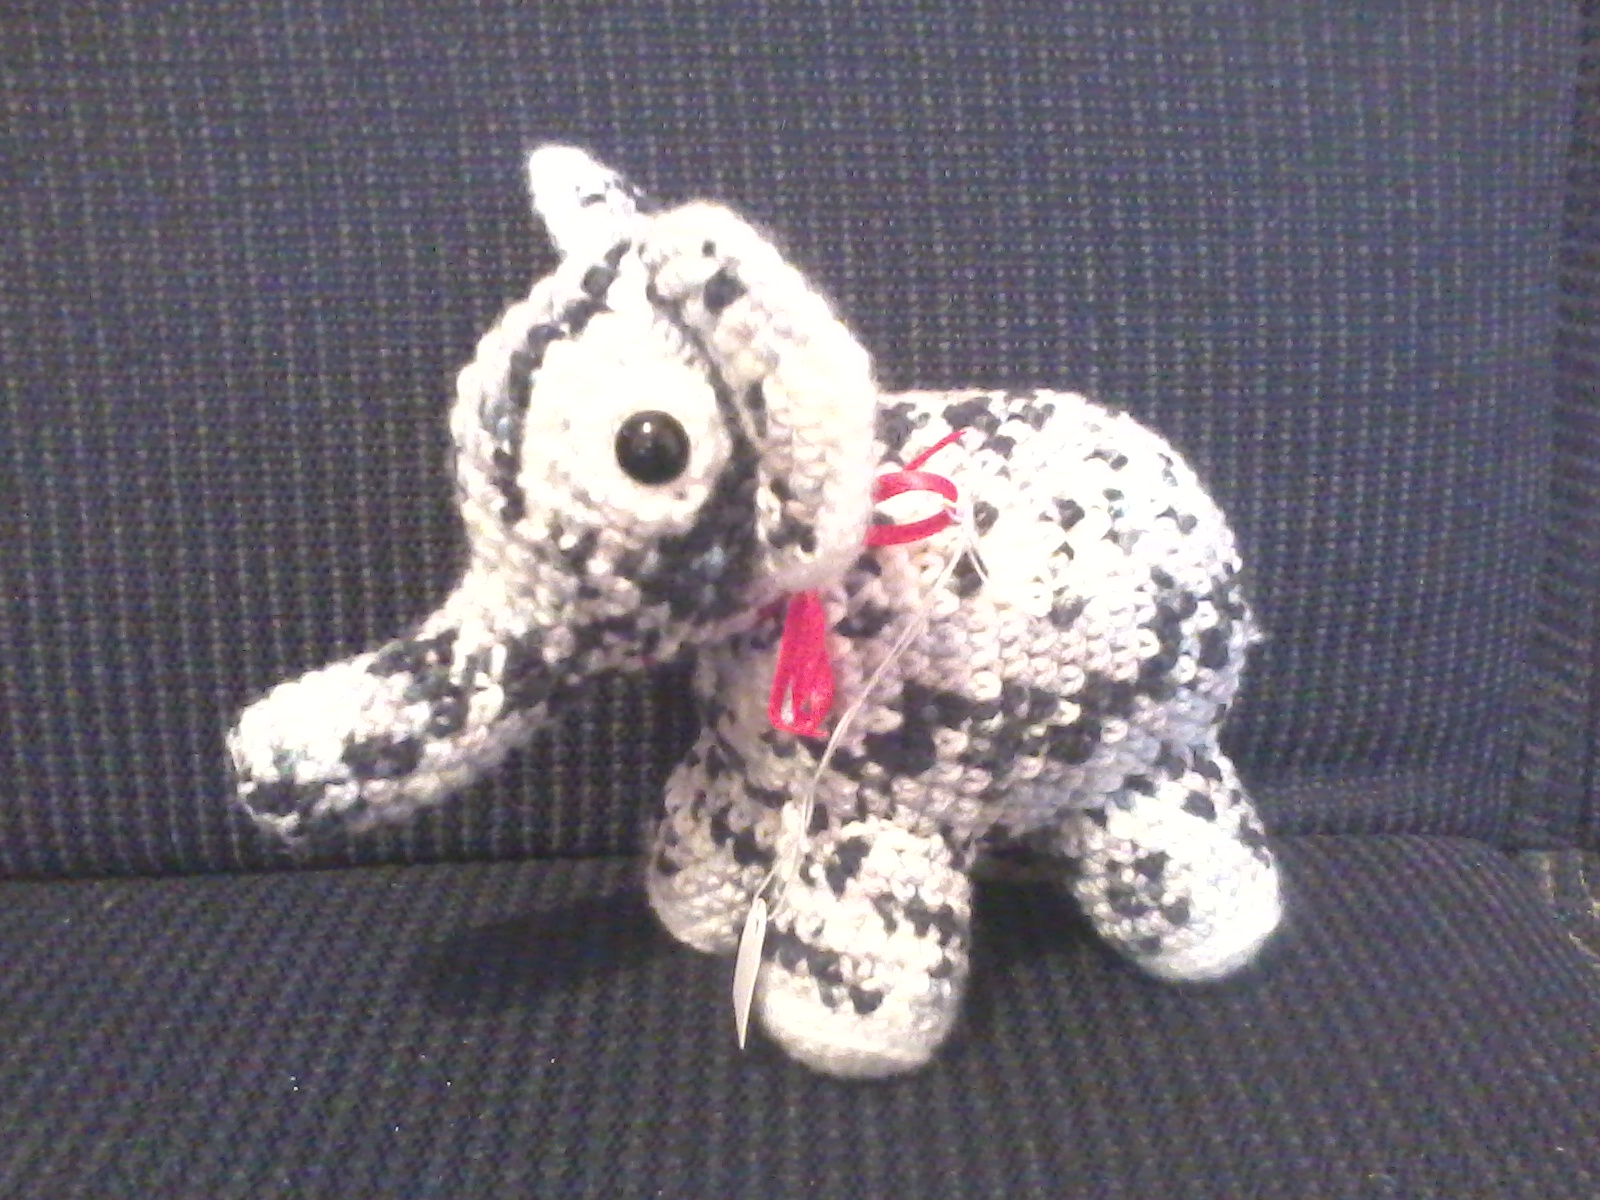 Amigurumi Uggla : Amigurumi av MAHO: Uggla, Nalle, Elefant